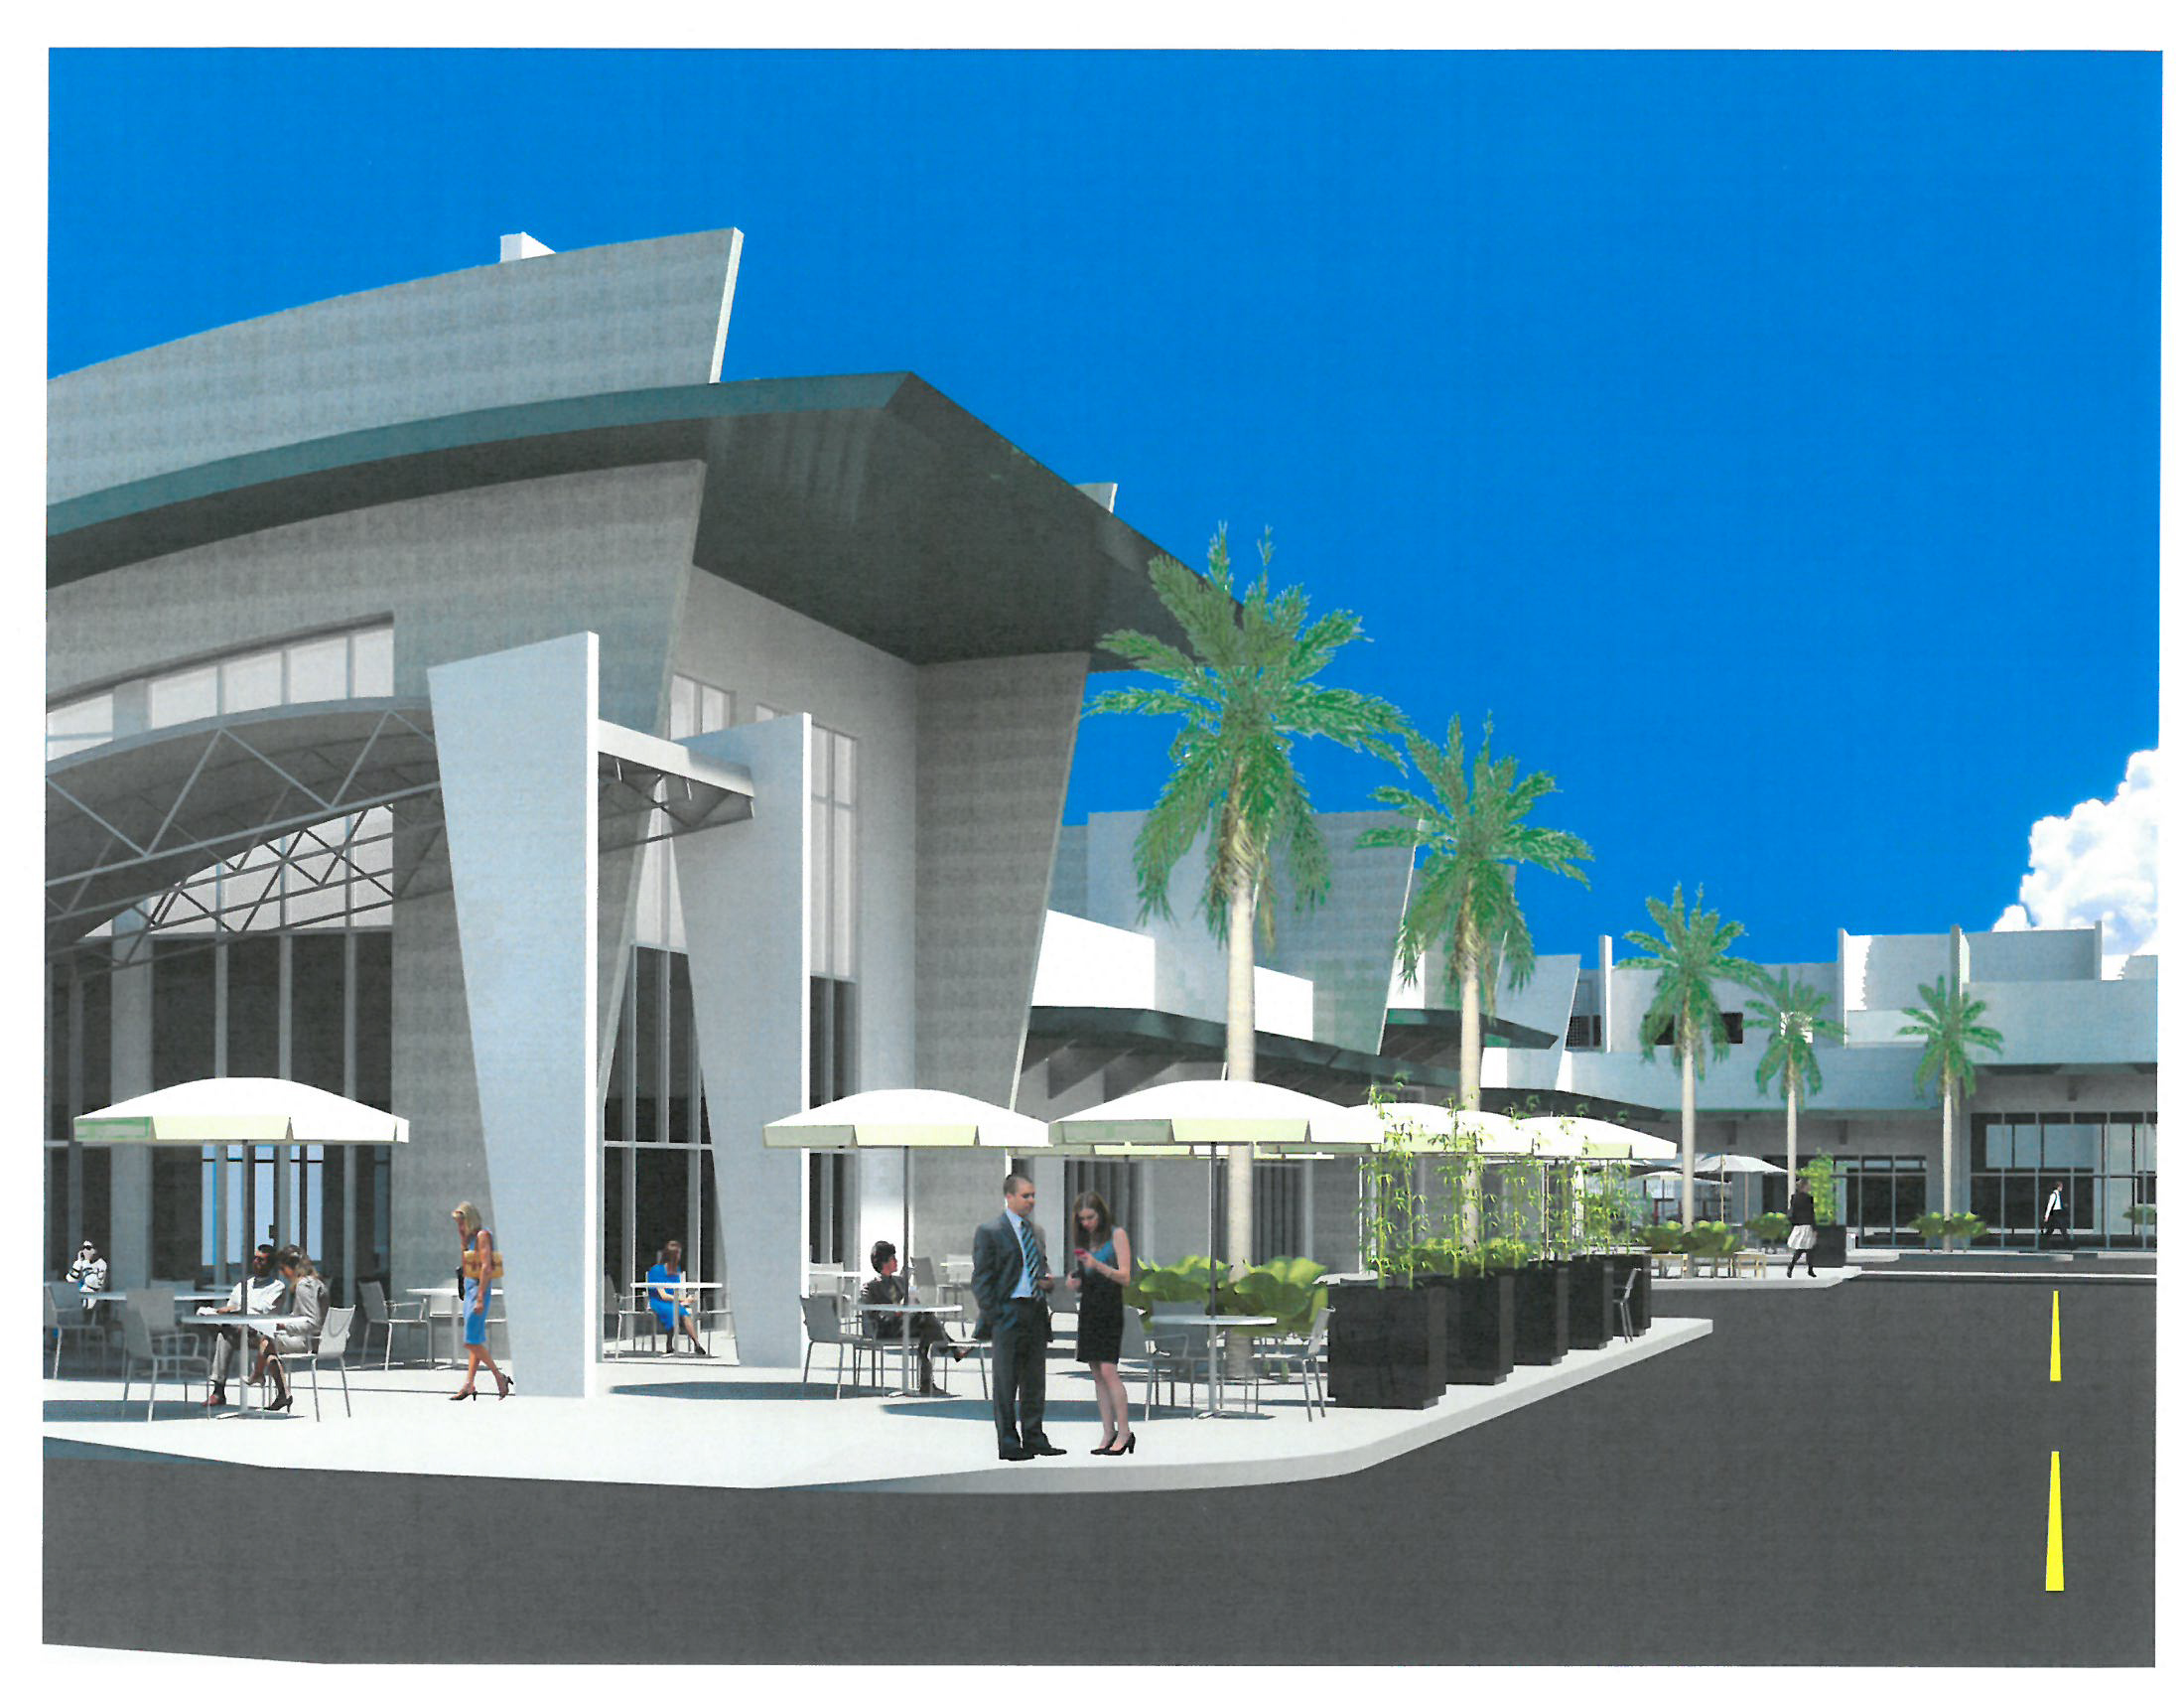 Crown Center Plaza - Fort Lauderdale Retail Center